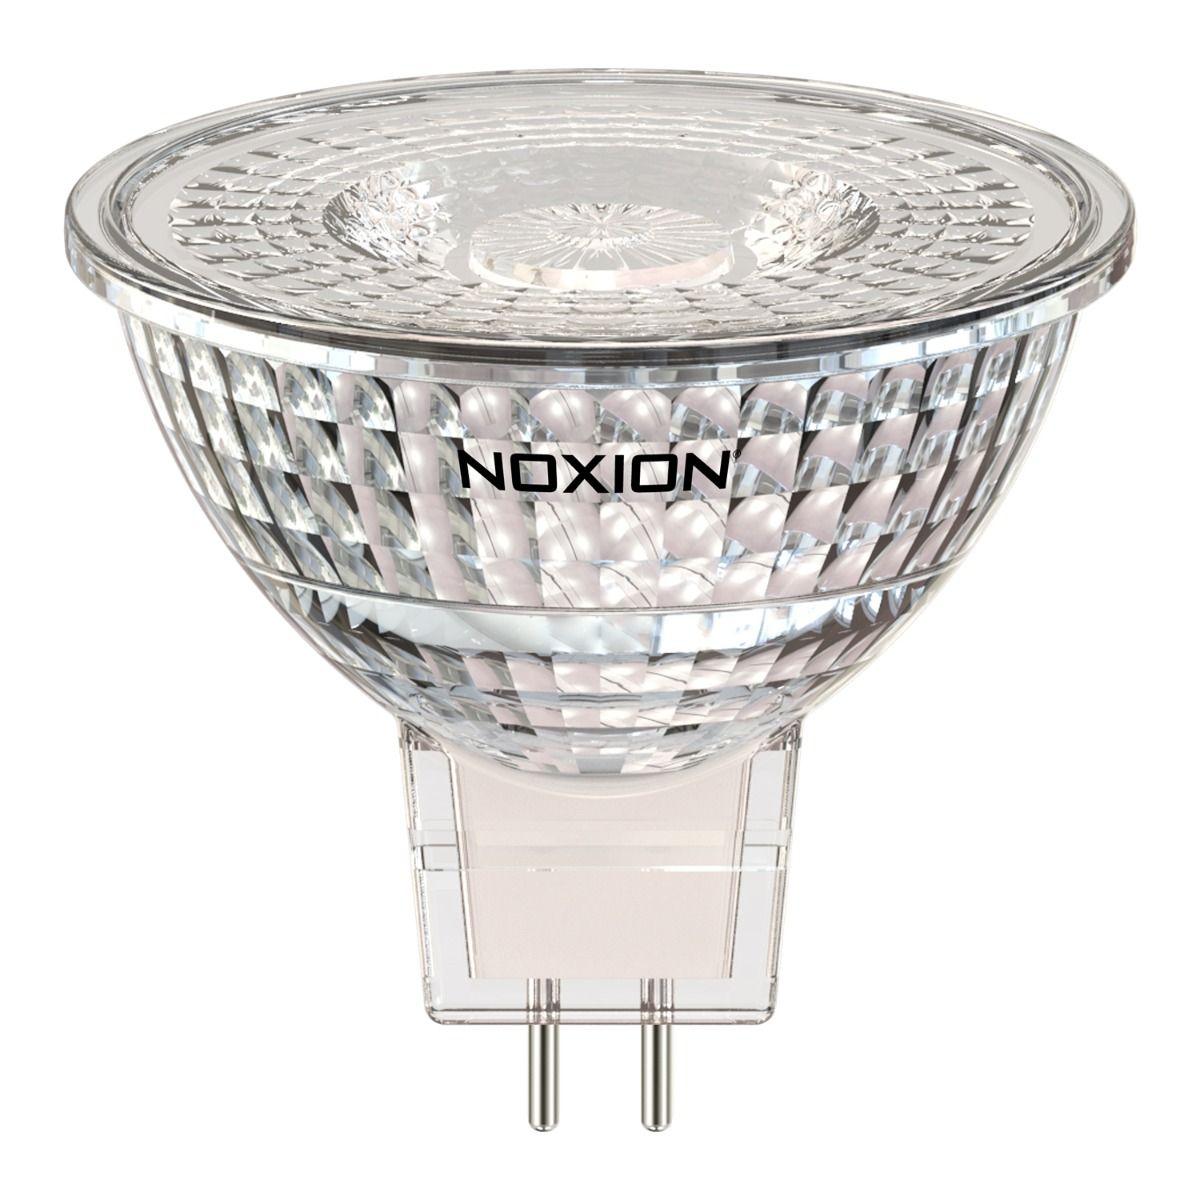 Noxion LED-Spot GU5.3 5W 830 60D 470lm | Dimmbar - Warmweiß - Ersatz für 35W